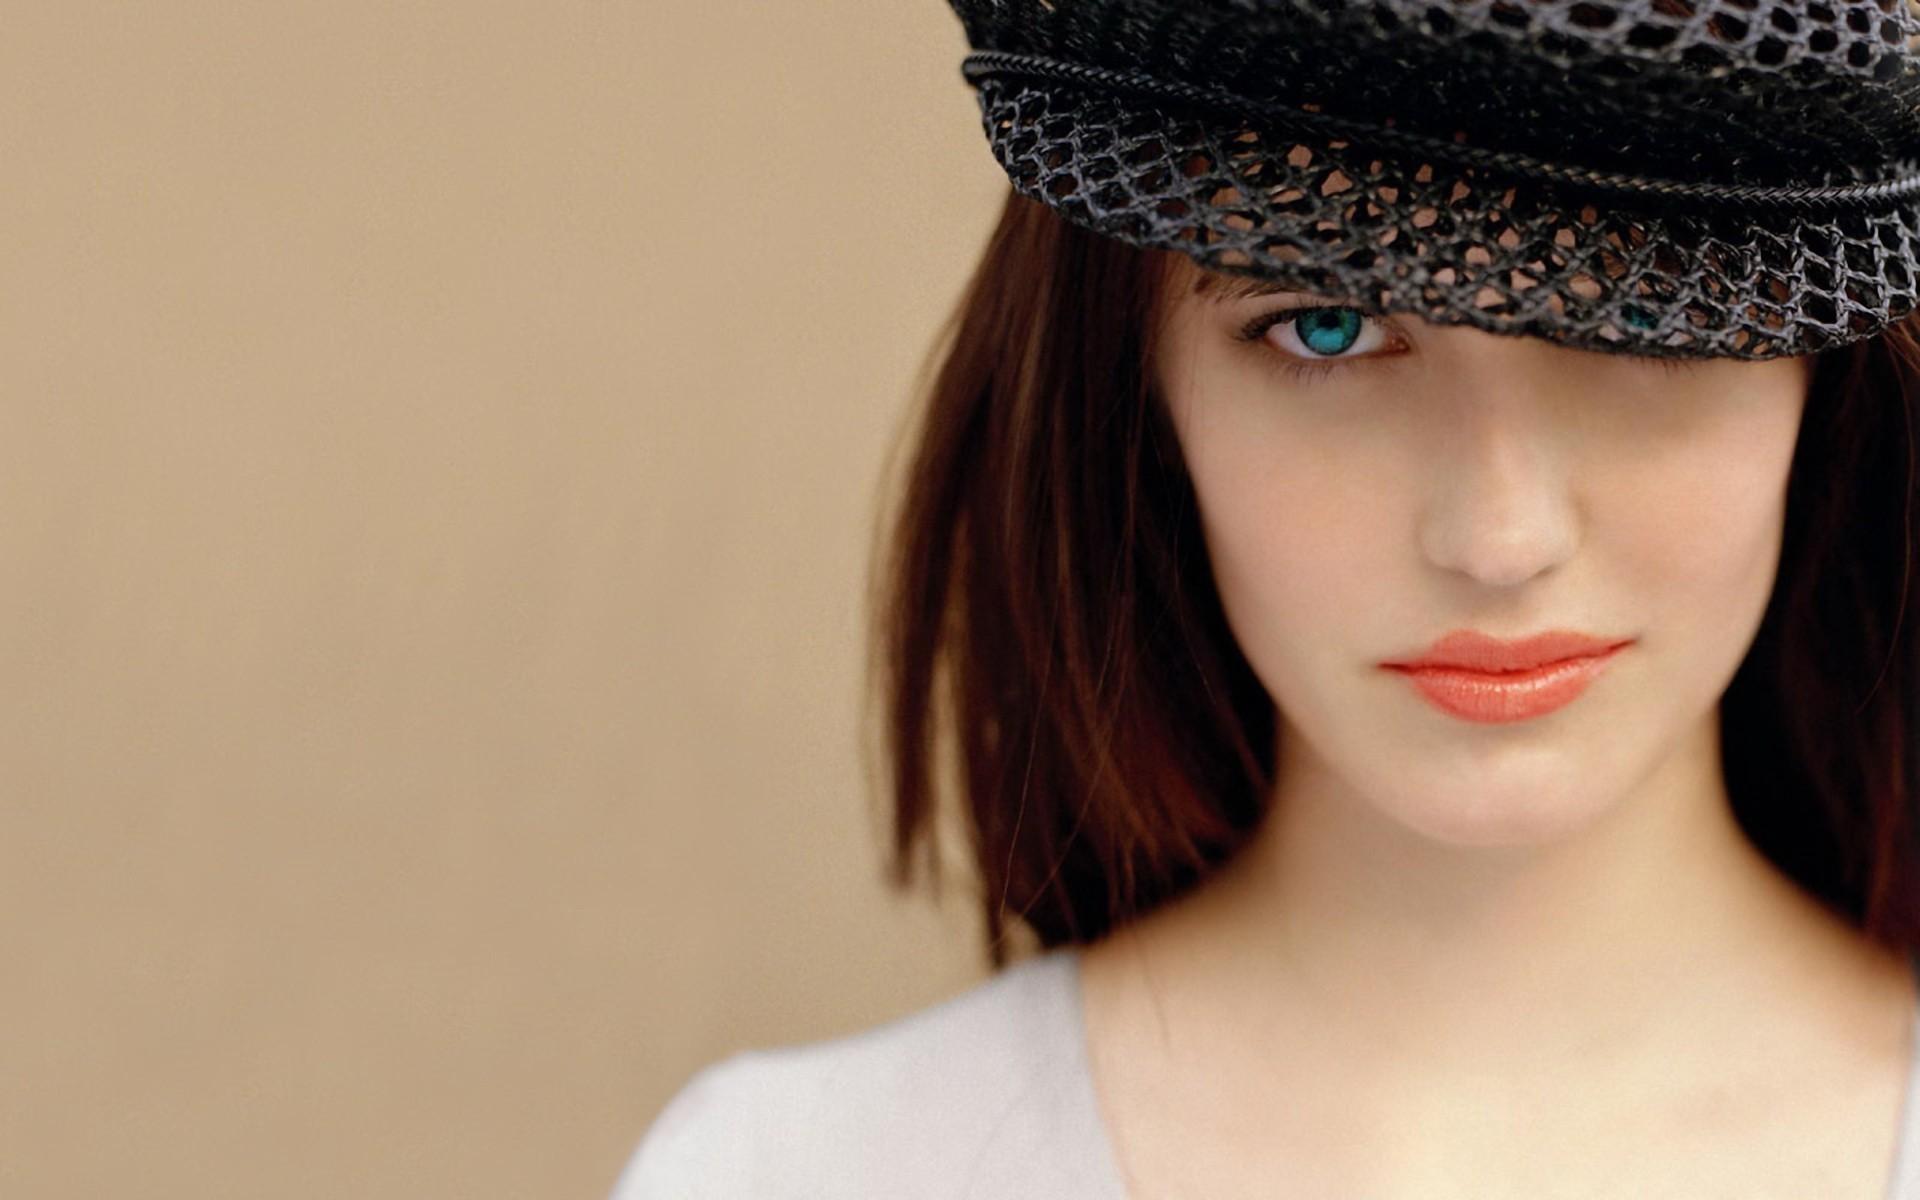 Most Beautiful Emilia Clarke Wallpaper | Full HD Pictures